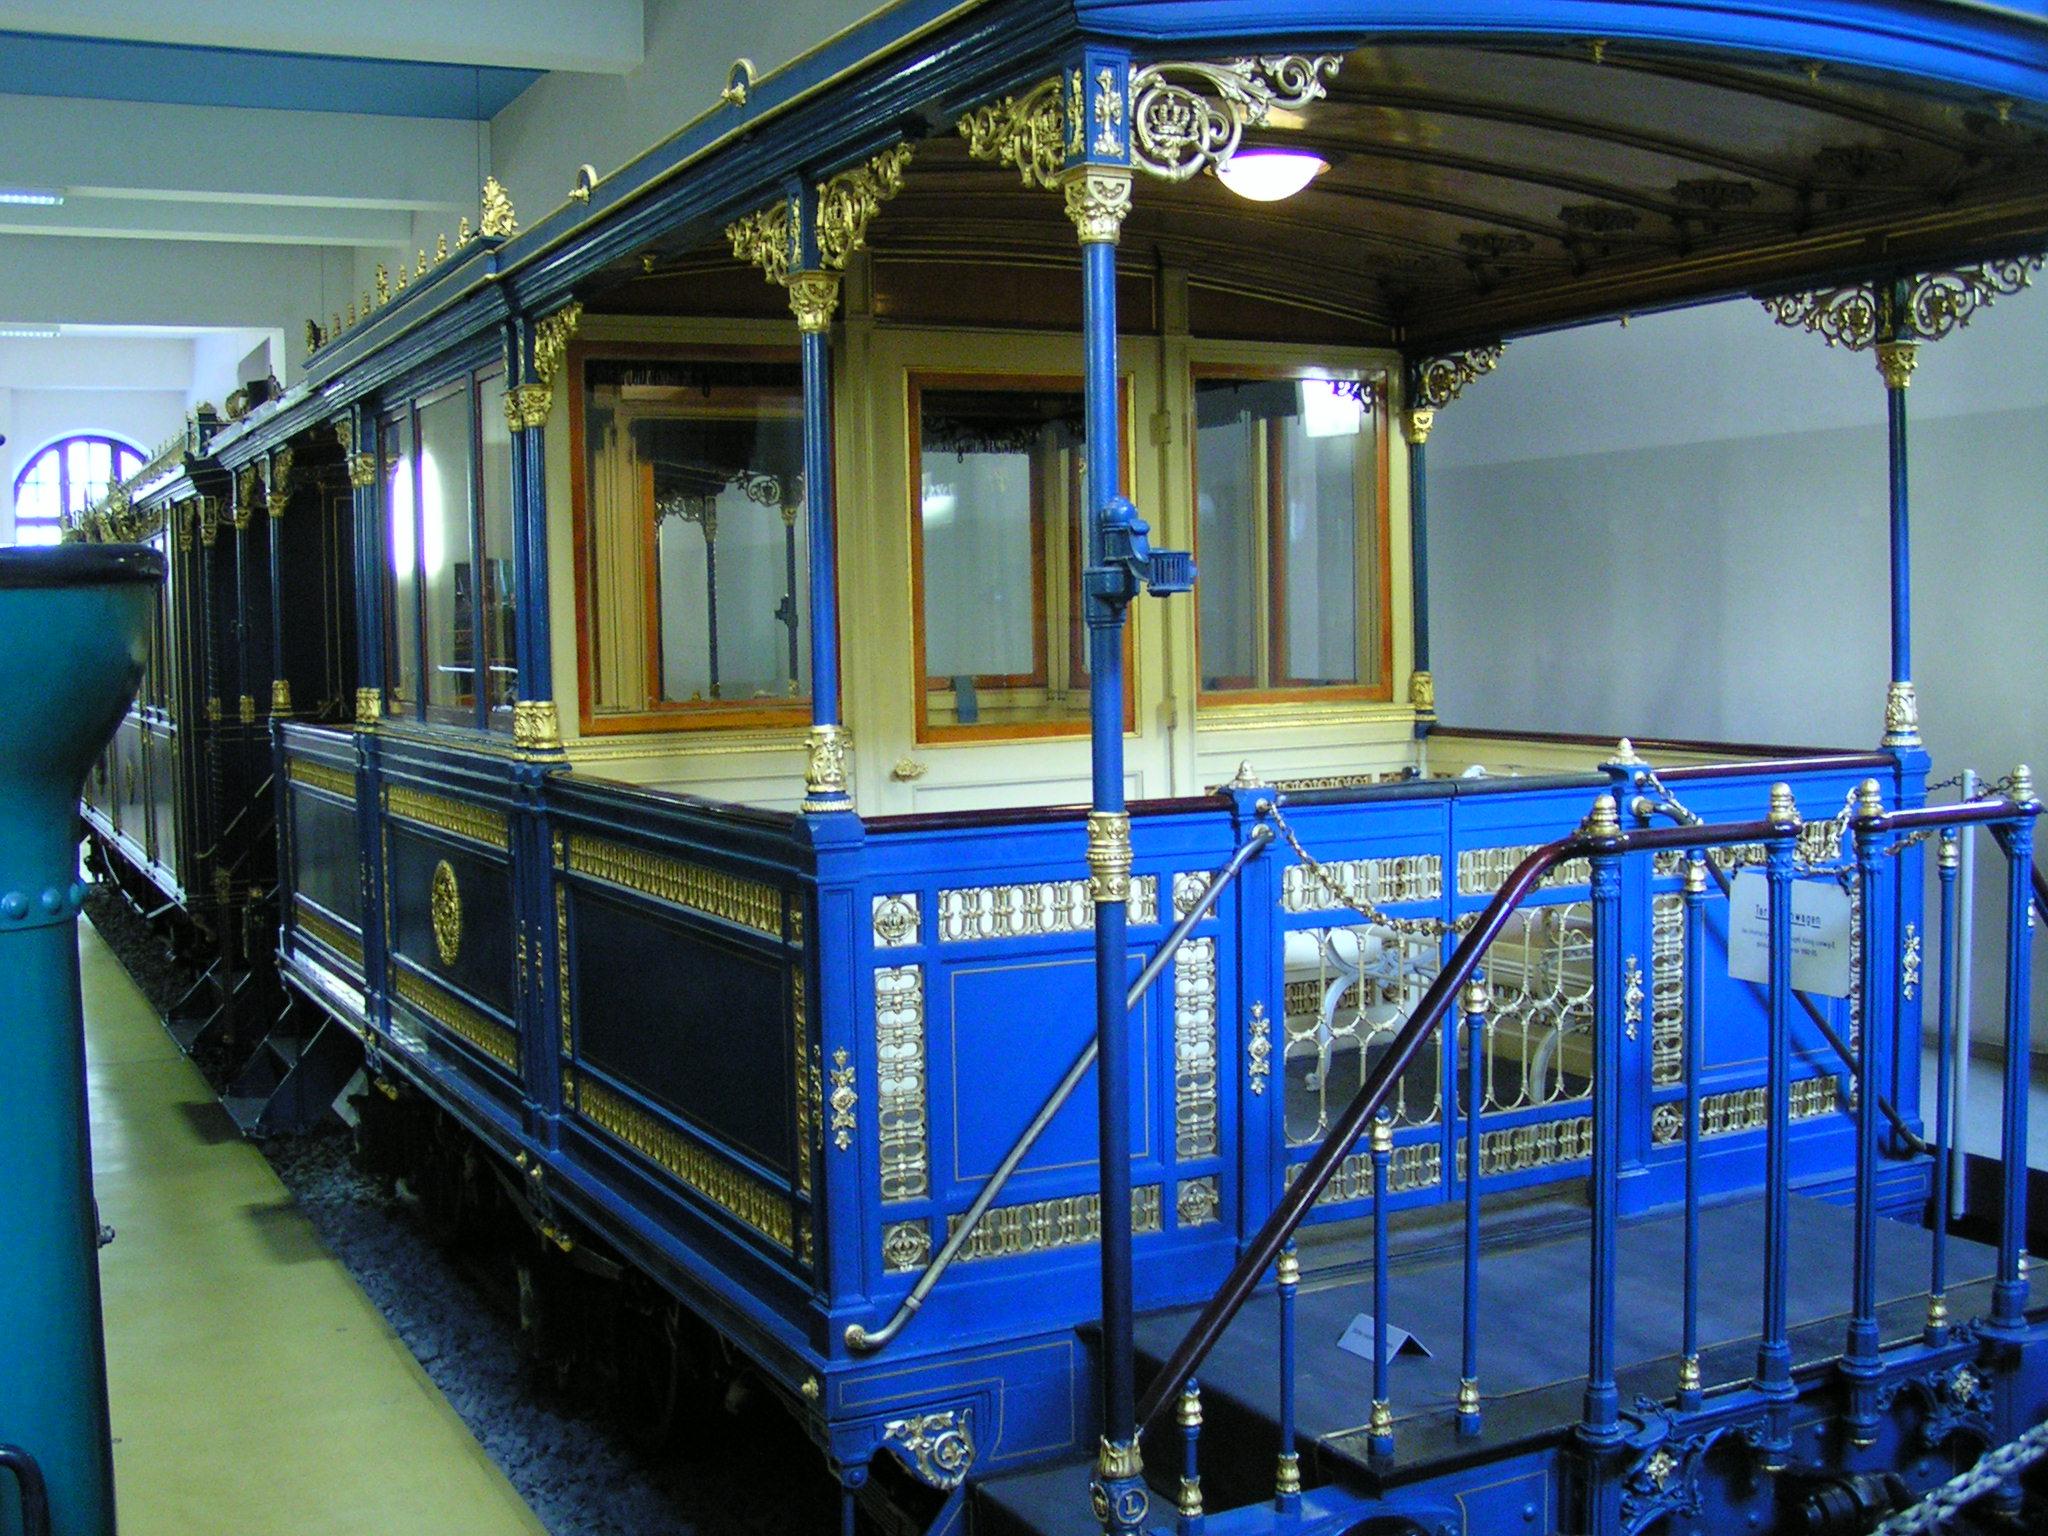 Terrassenwagen of Ludwig II per Wikimedia